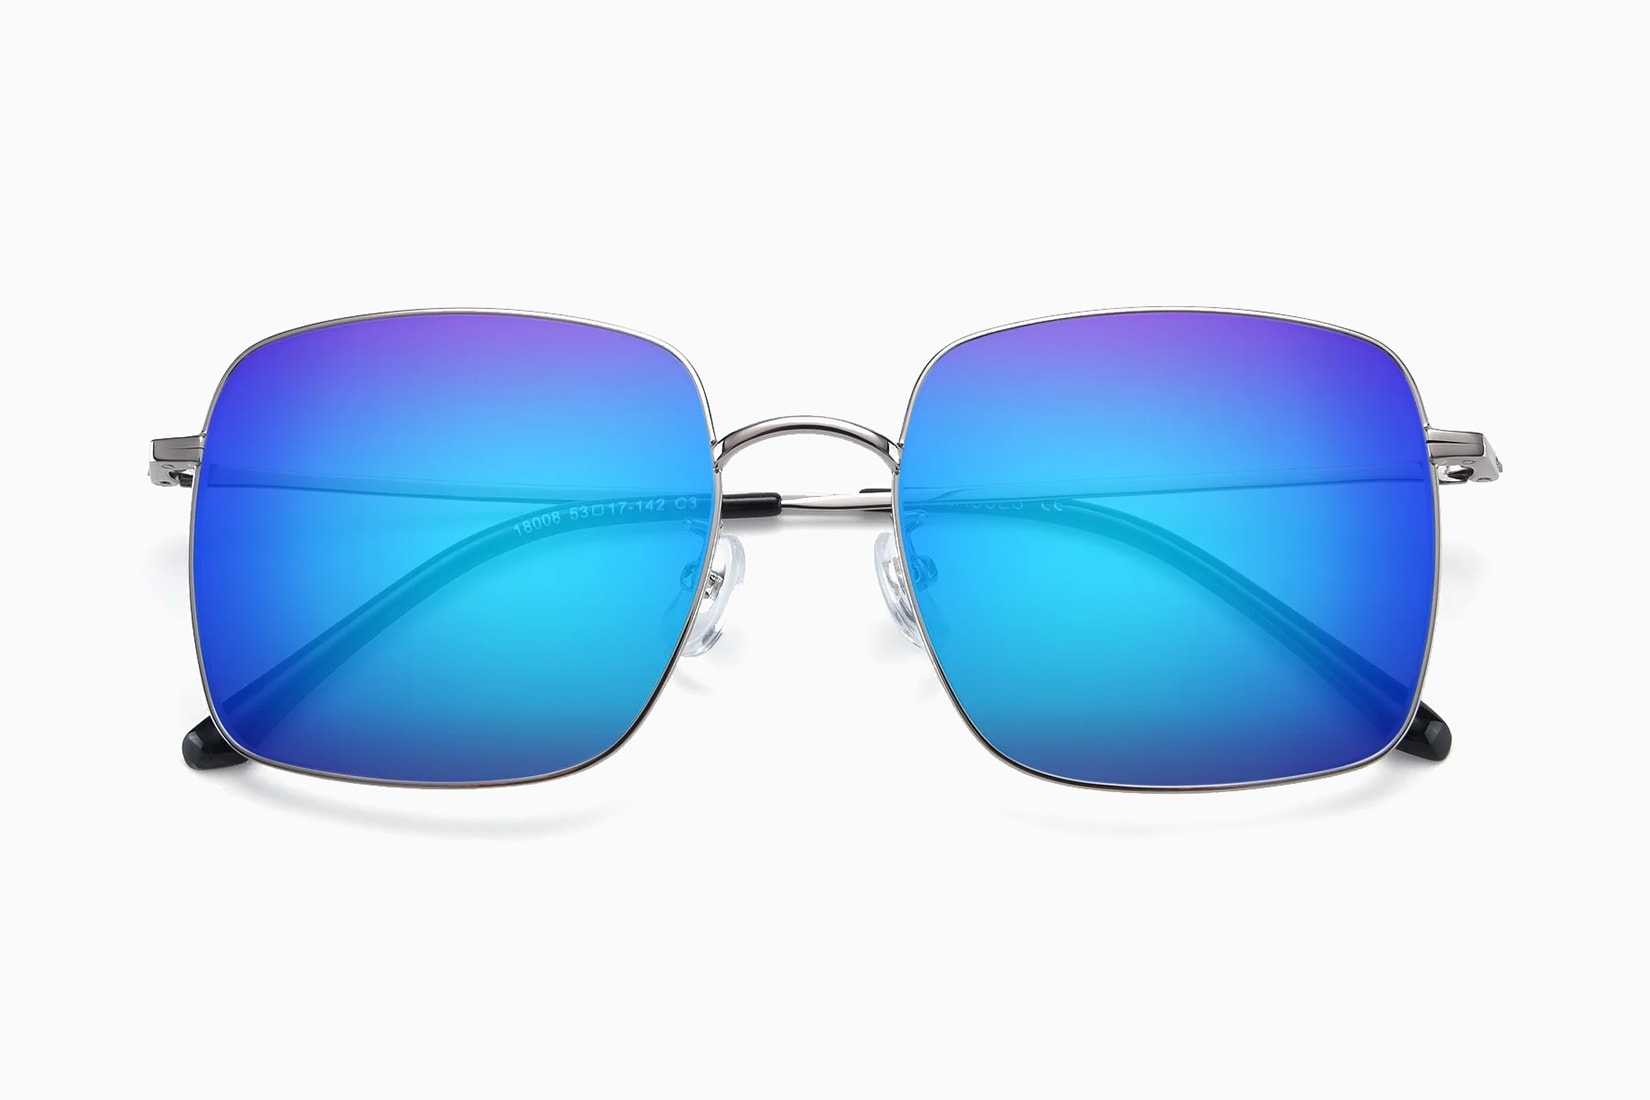 best value women sunglasses Yesglasses review - Luxe Digital